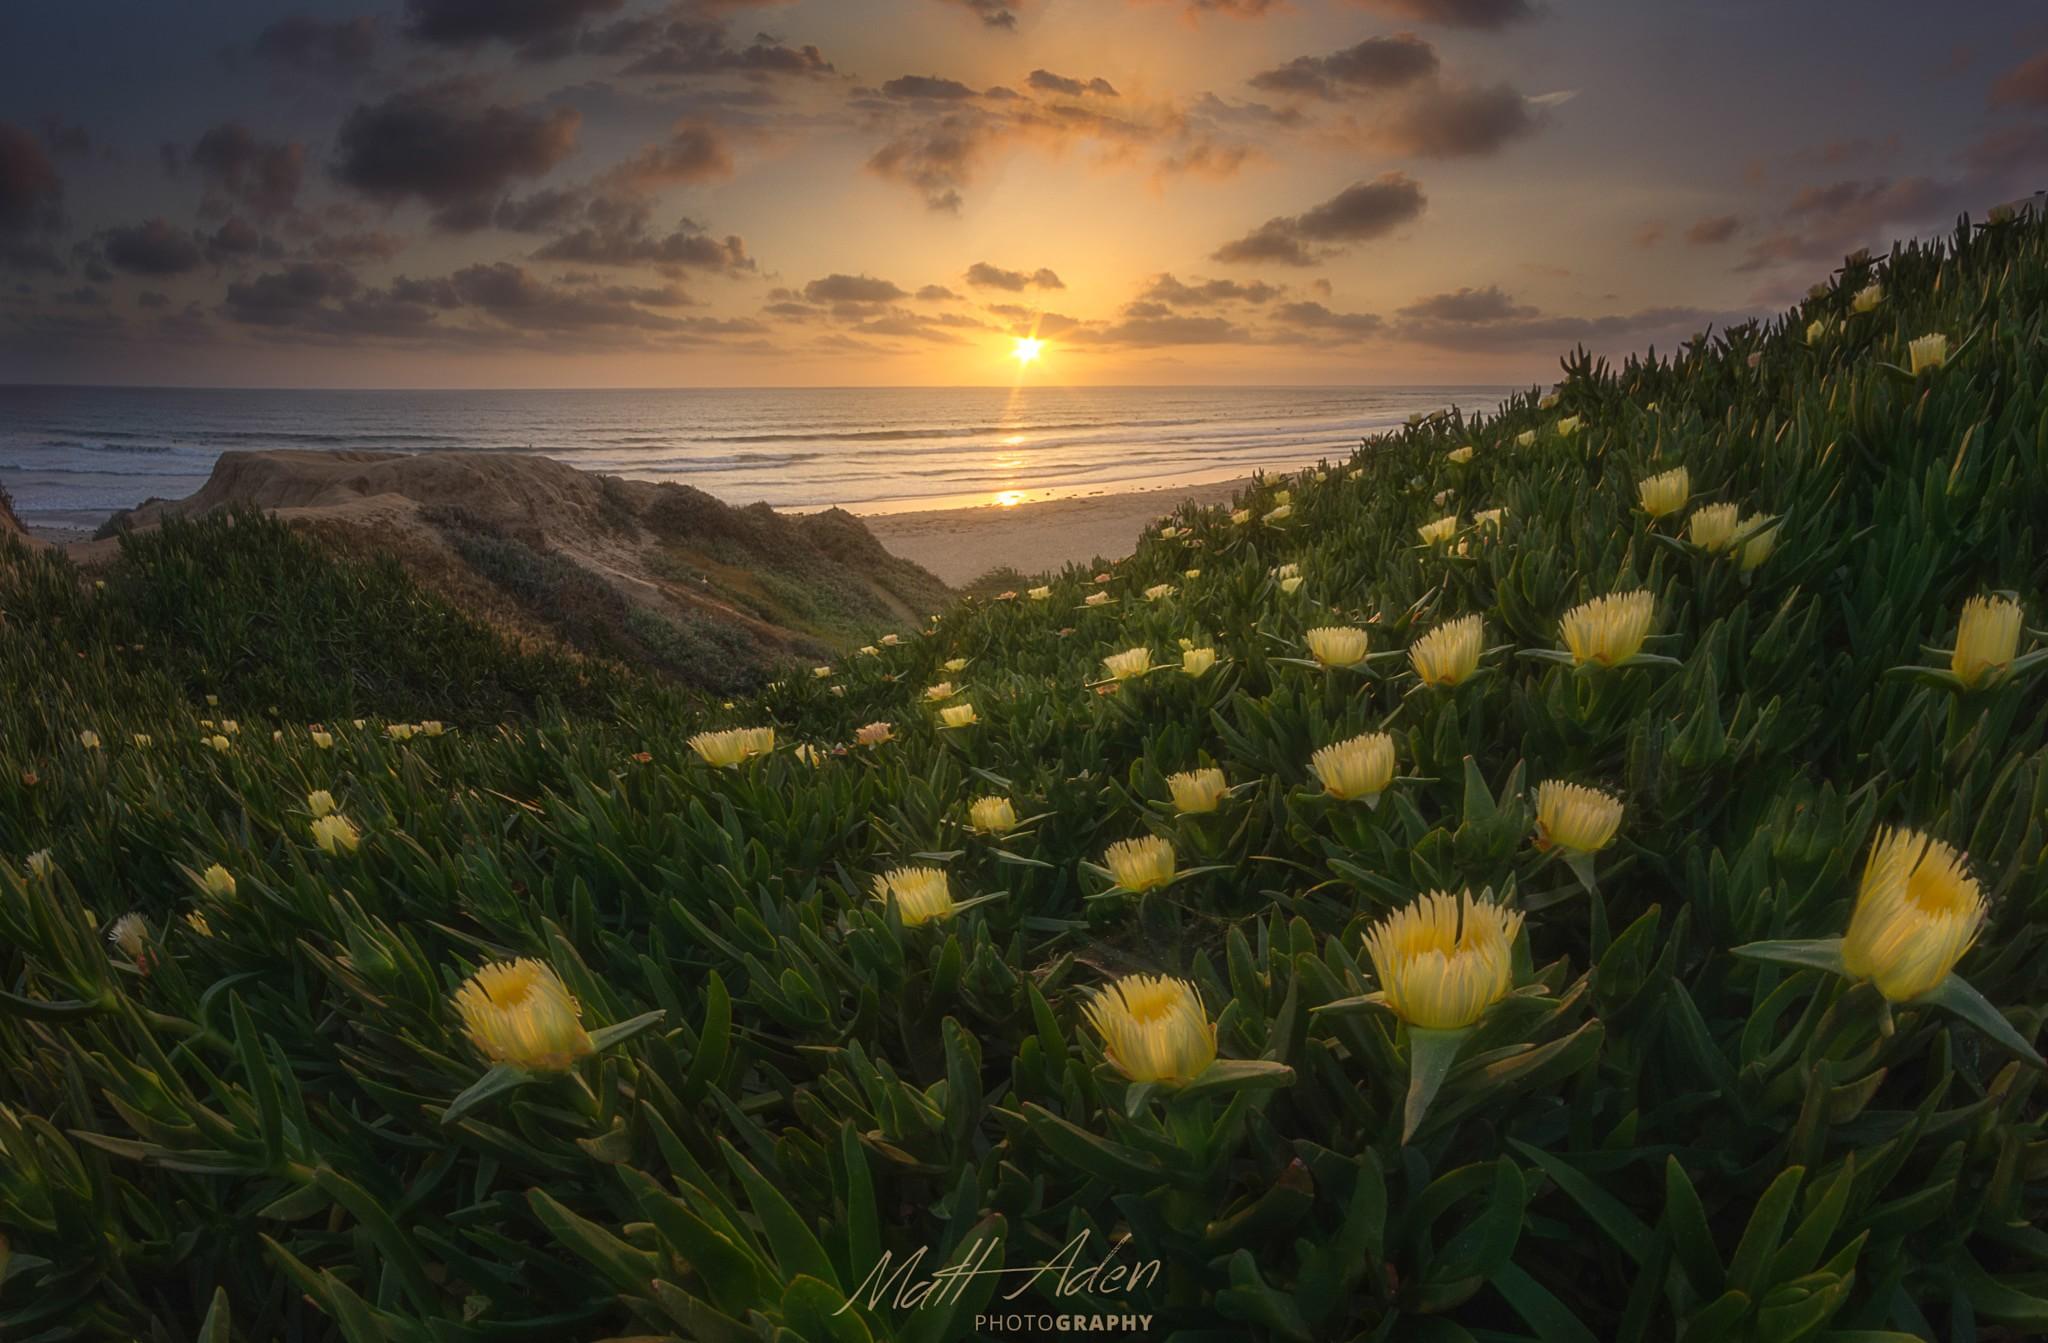 Nature Landscapes By Matt Aden